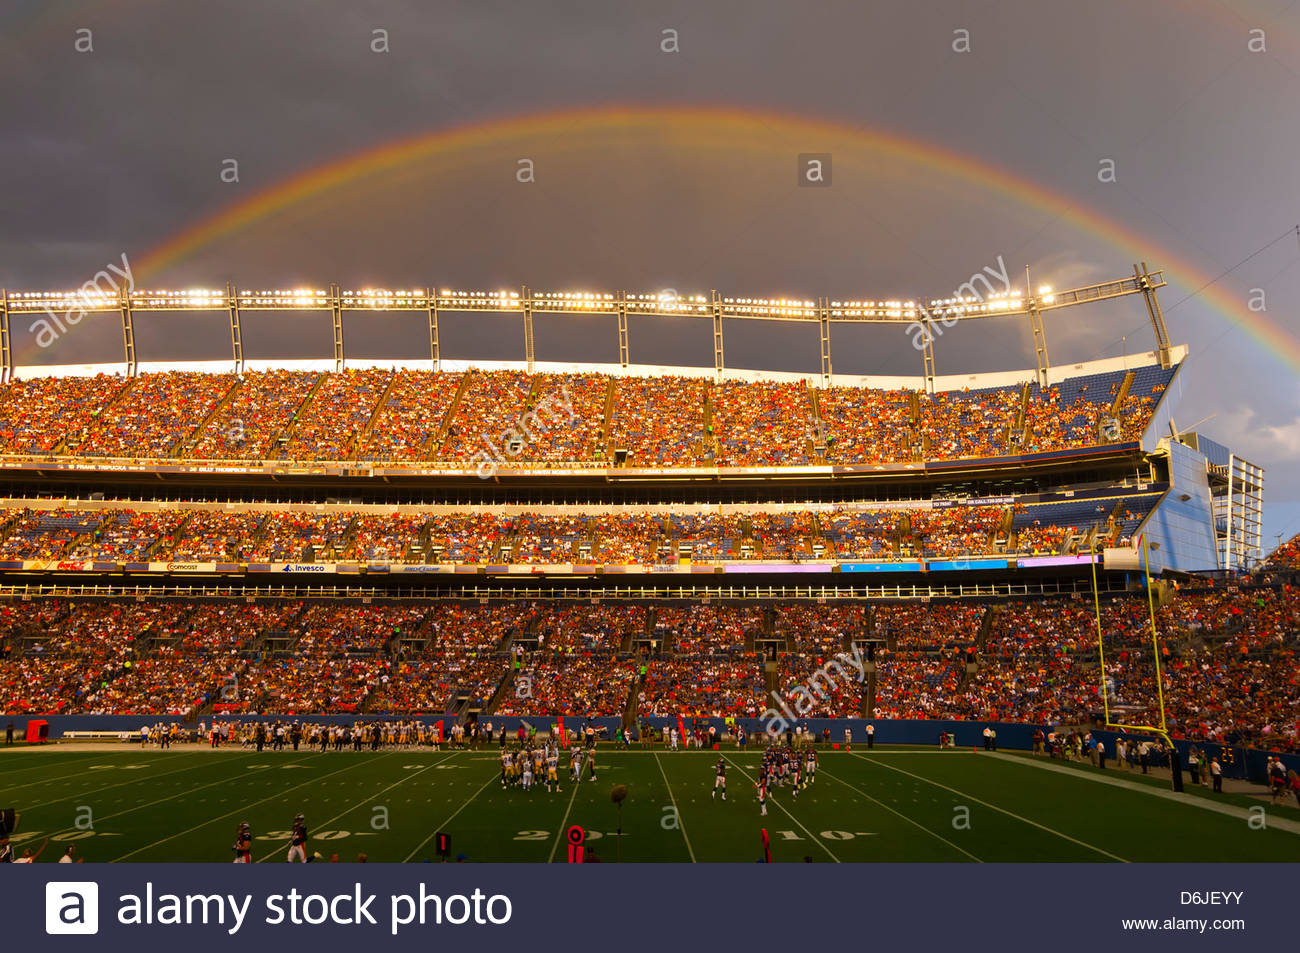 A rainbow over Sports Authority Field at Mile High (stadium), Denver, Colorado USA Stock Photo